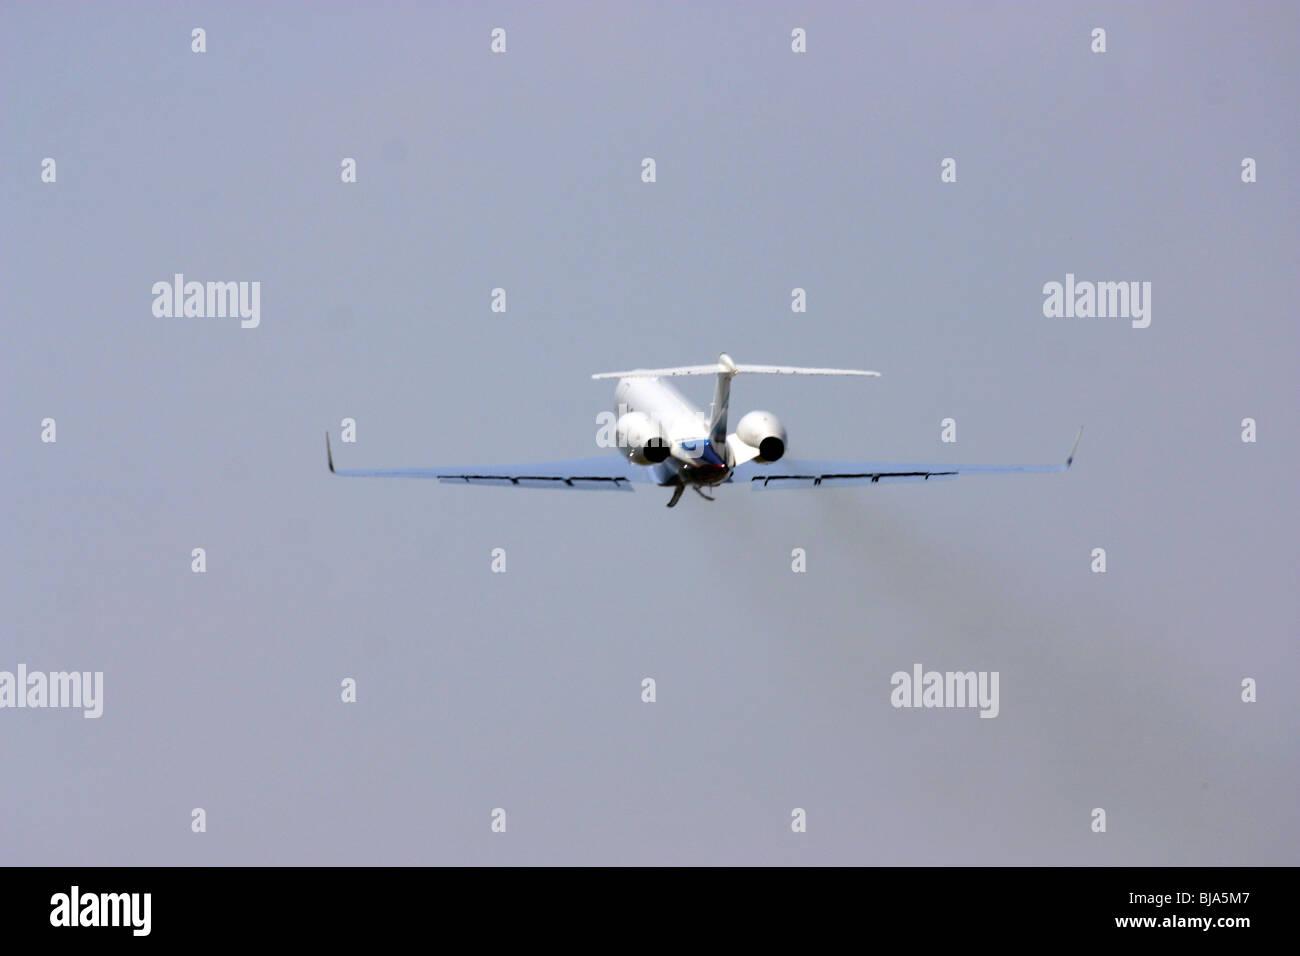 Private Jet,takeoff,aviation,FAA,thrust,engine smoke,jet thrust - Stock Image